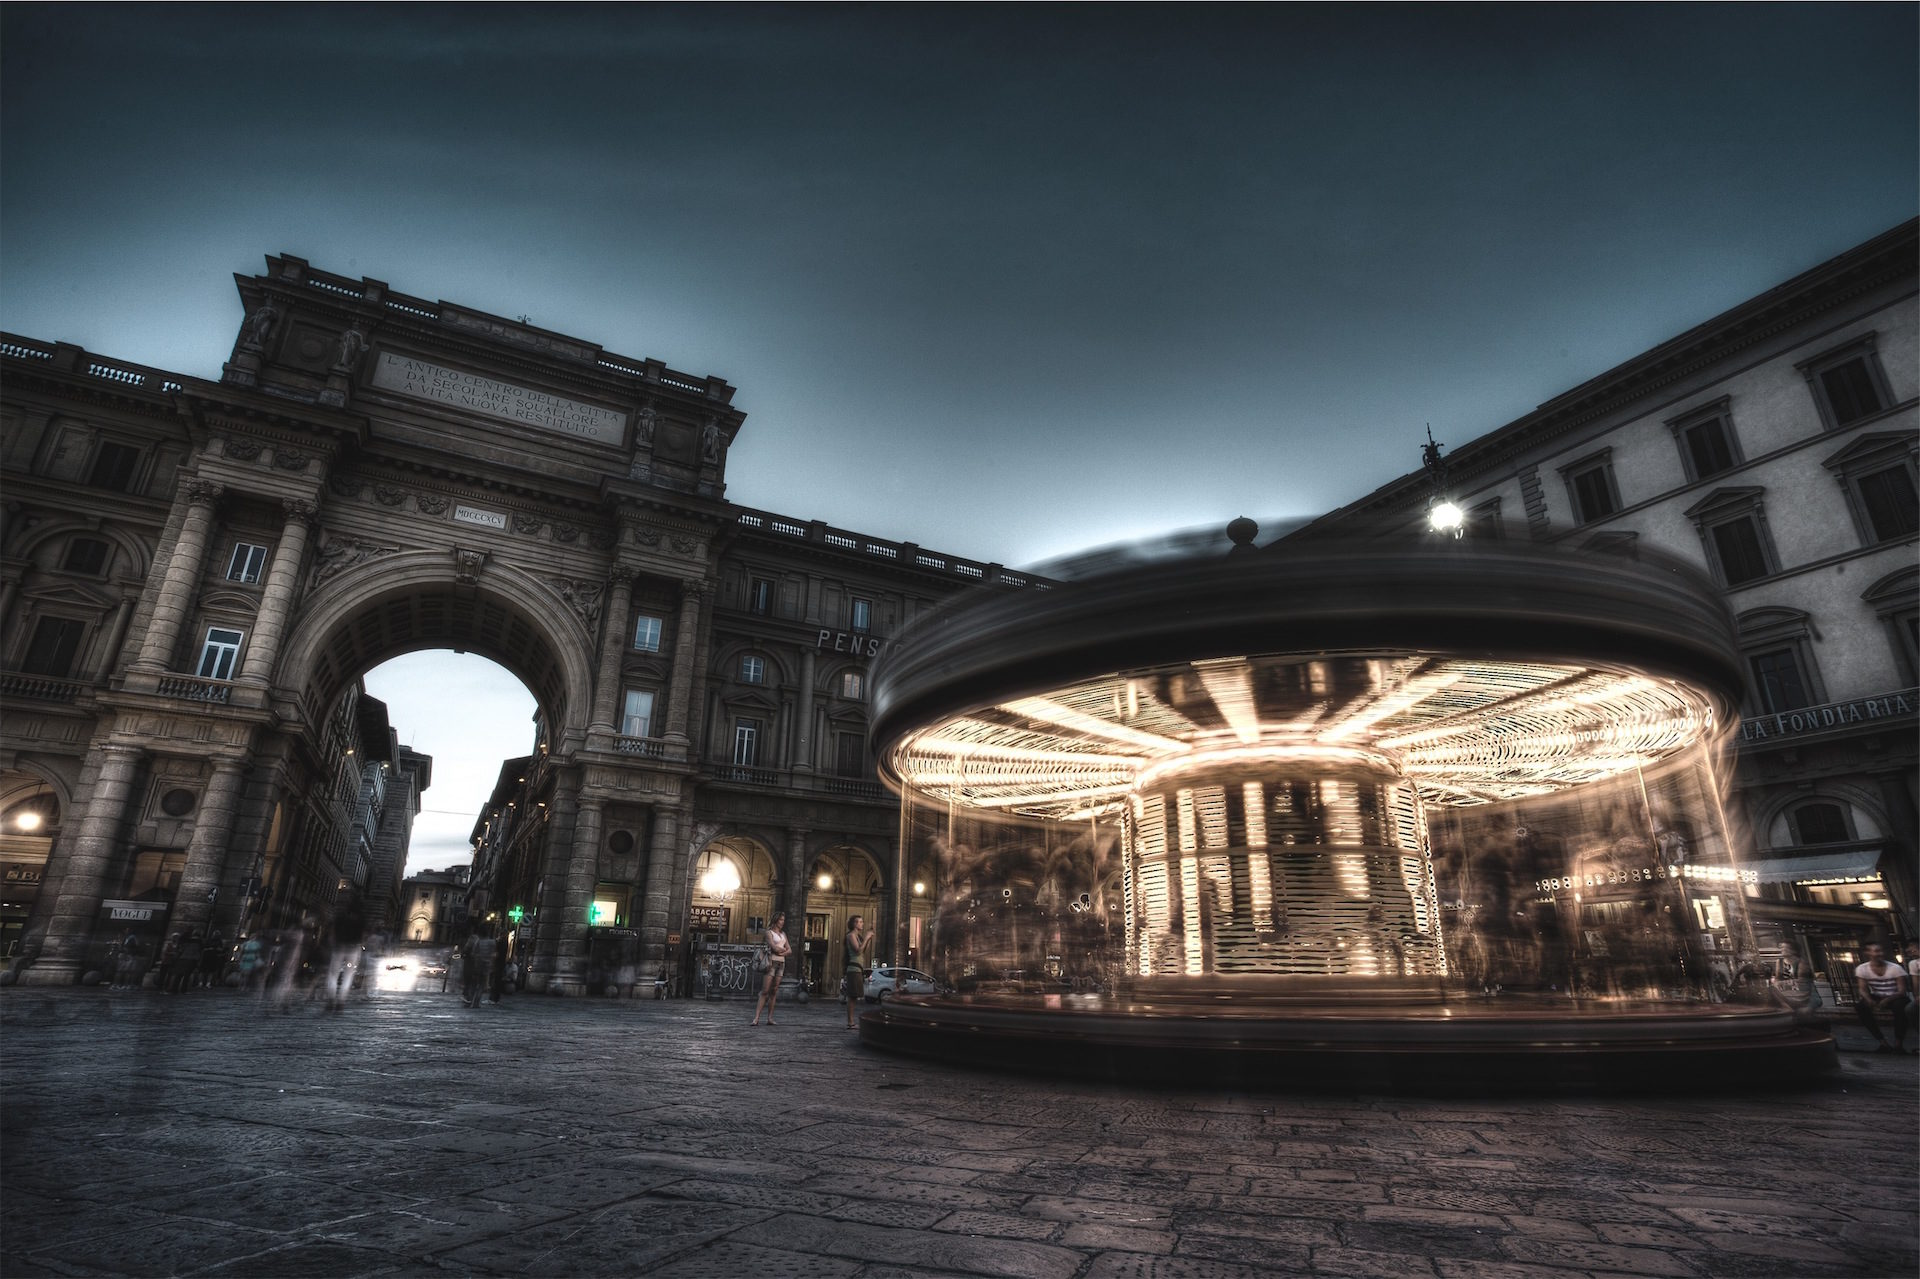 Plaza, Attraktion, Licht, Bewegung, Gebäude - Wallpaper HD - Prof.-falken.com